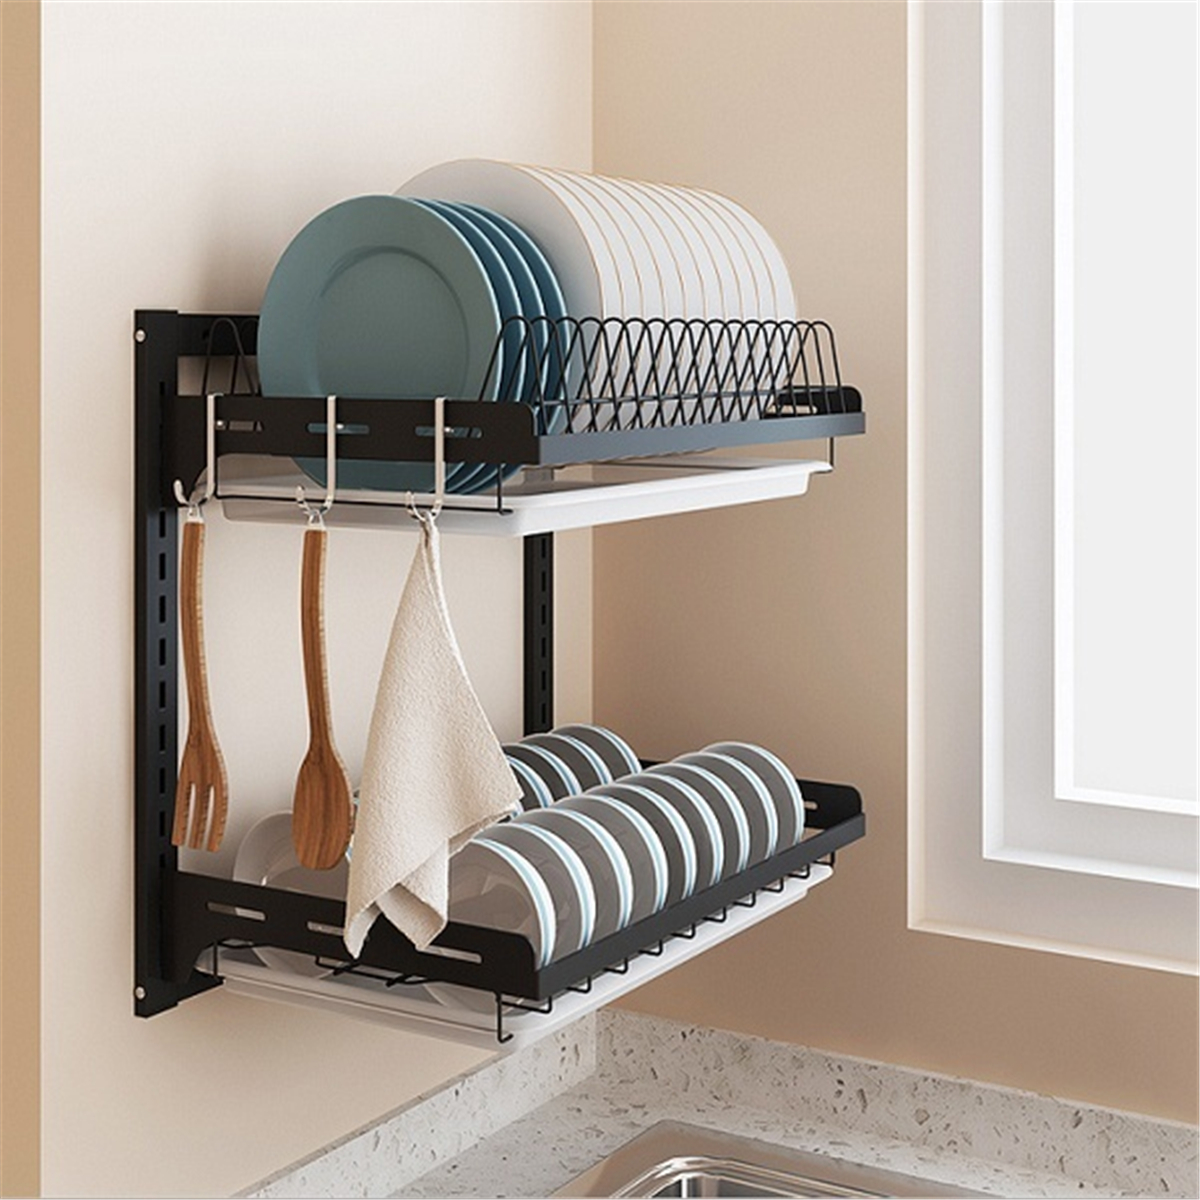 2 Layer Stainless Steel Wall Mounted Kitchen Shelf Rack Adjustable Plate Dish Storage Organizer Holders In Black Walmart Com Walmart Com